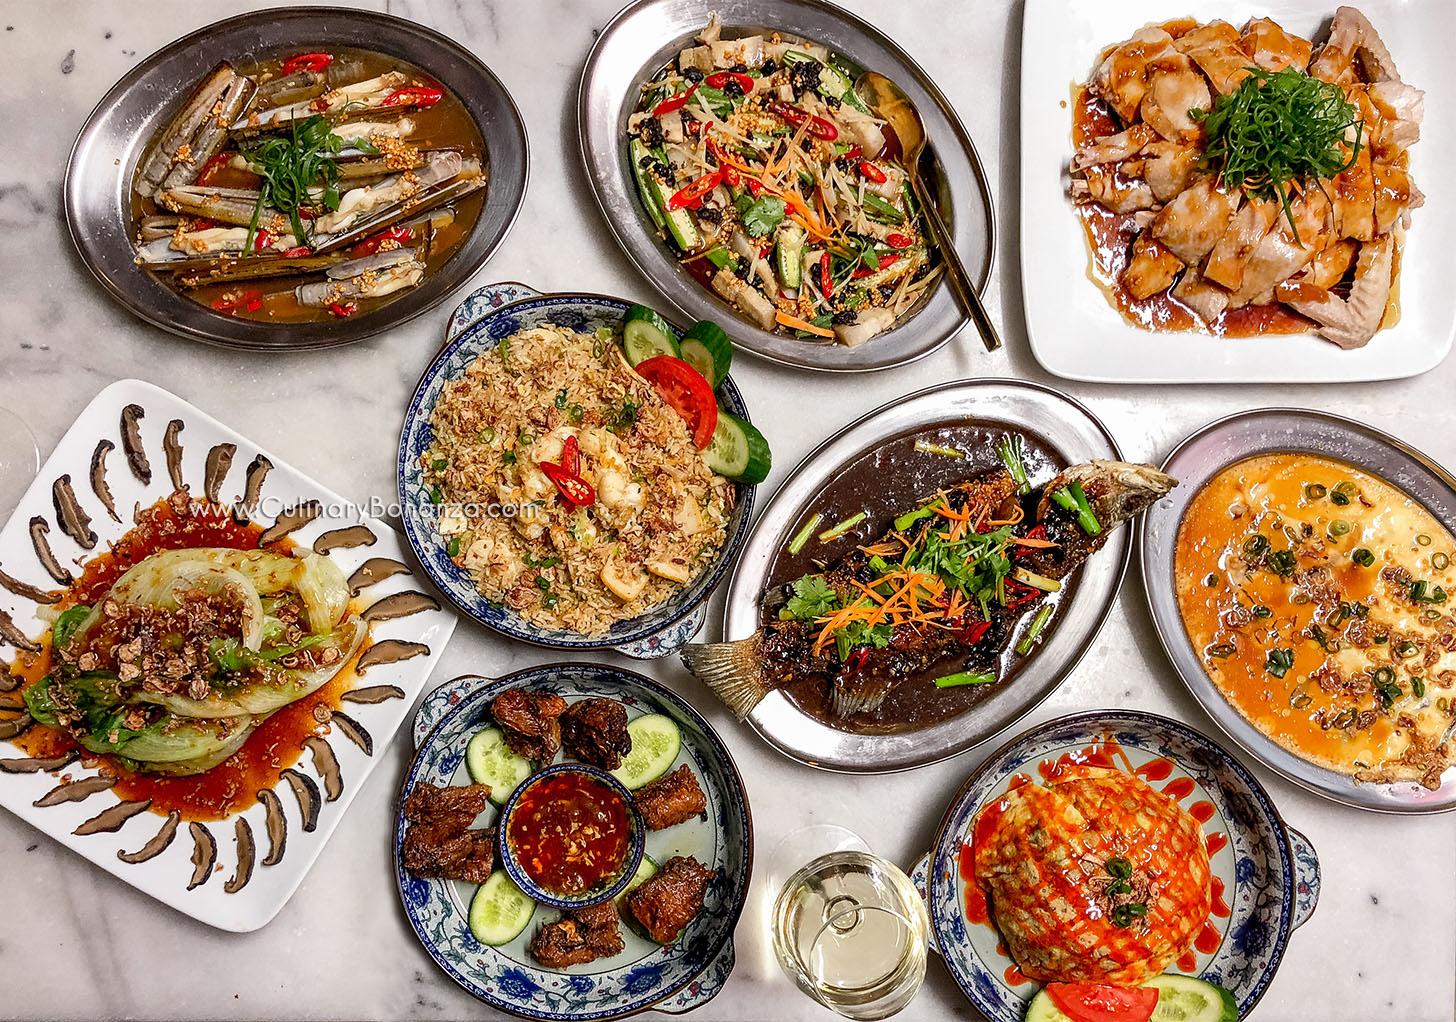 Ho Jiak Haymarket menu (www.culinarybonanza.com)